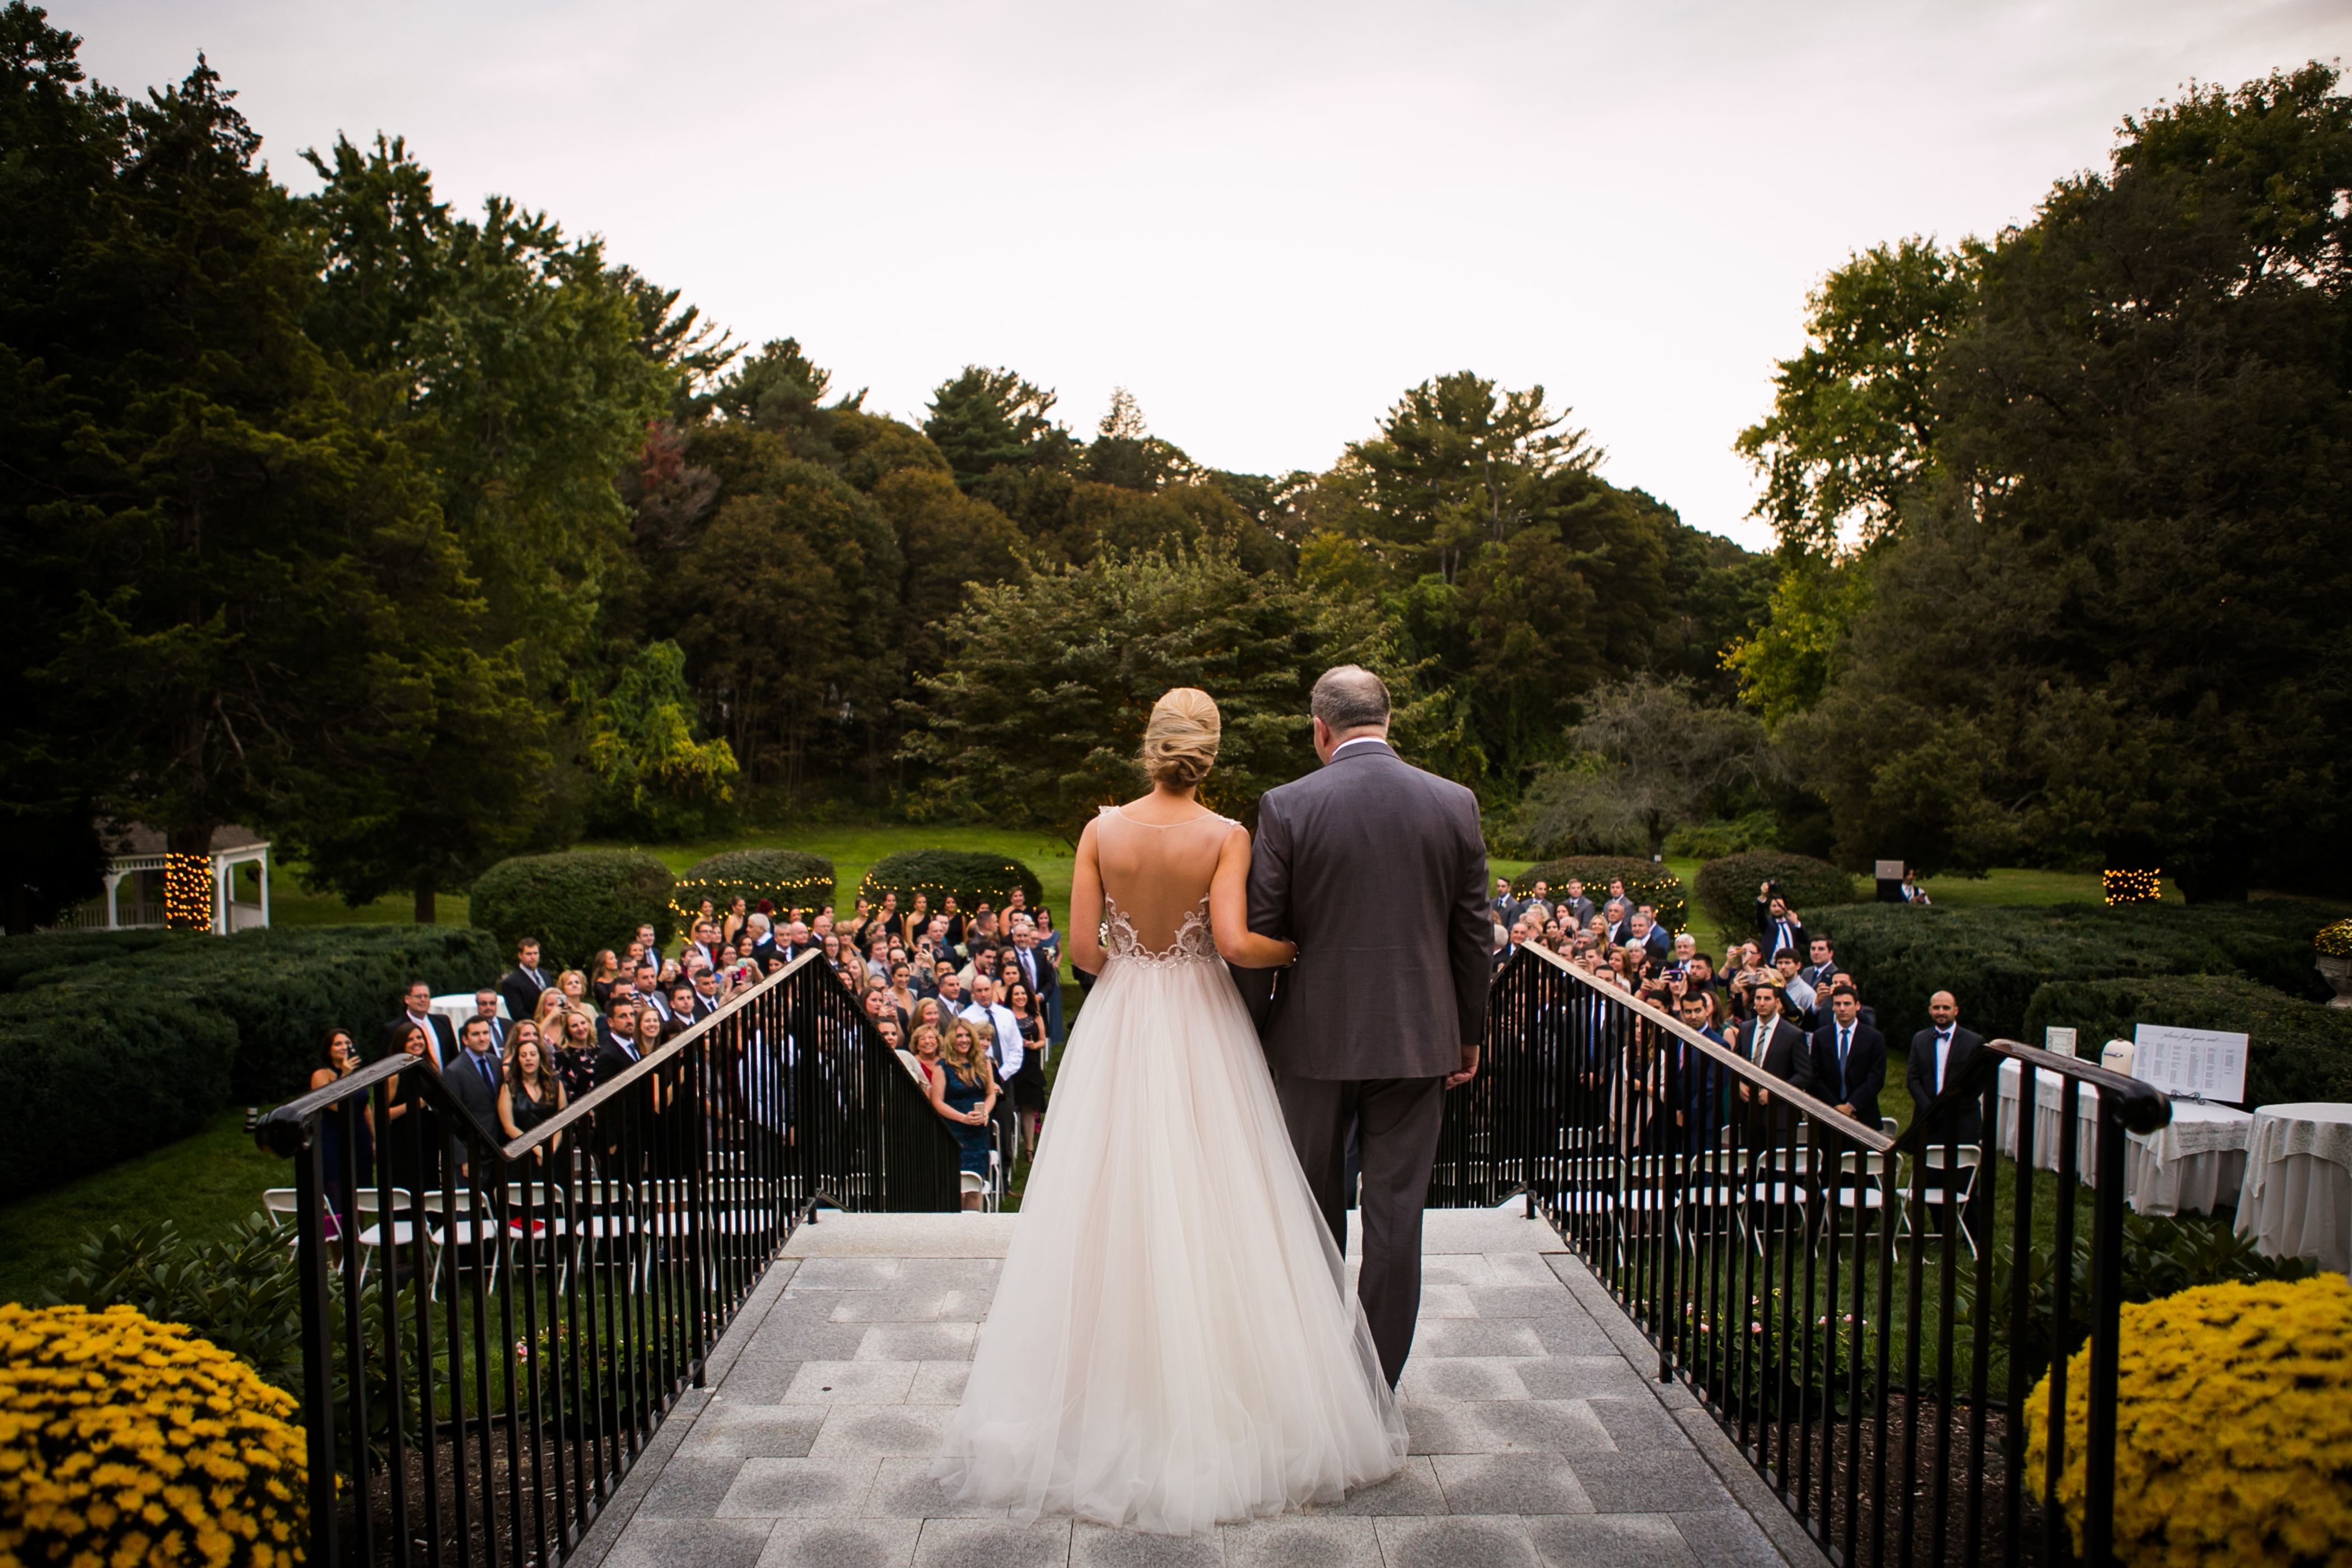 The Hellenic Center Ipswich Ma Weddings Garden Wedding Venues 01938